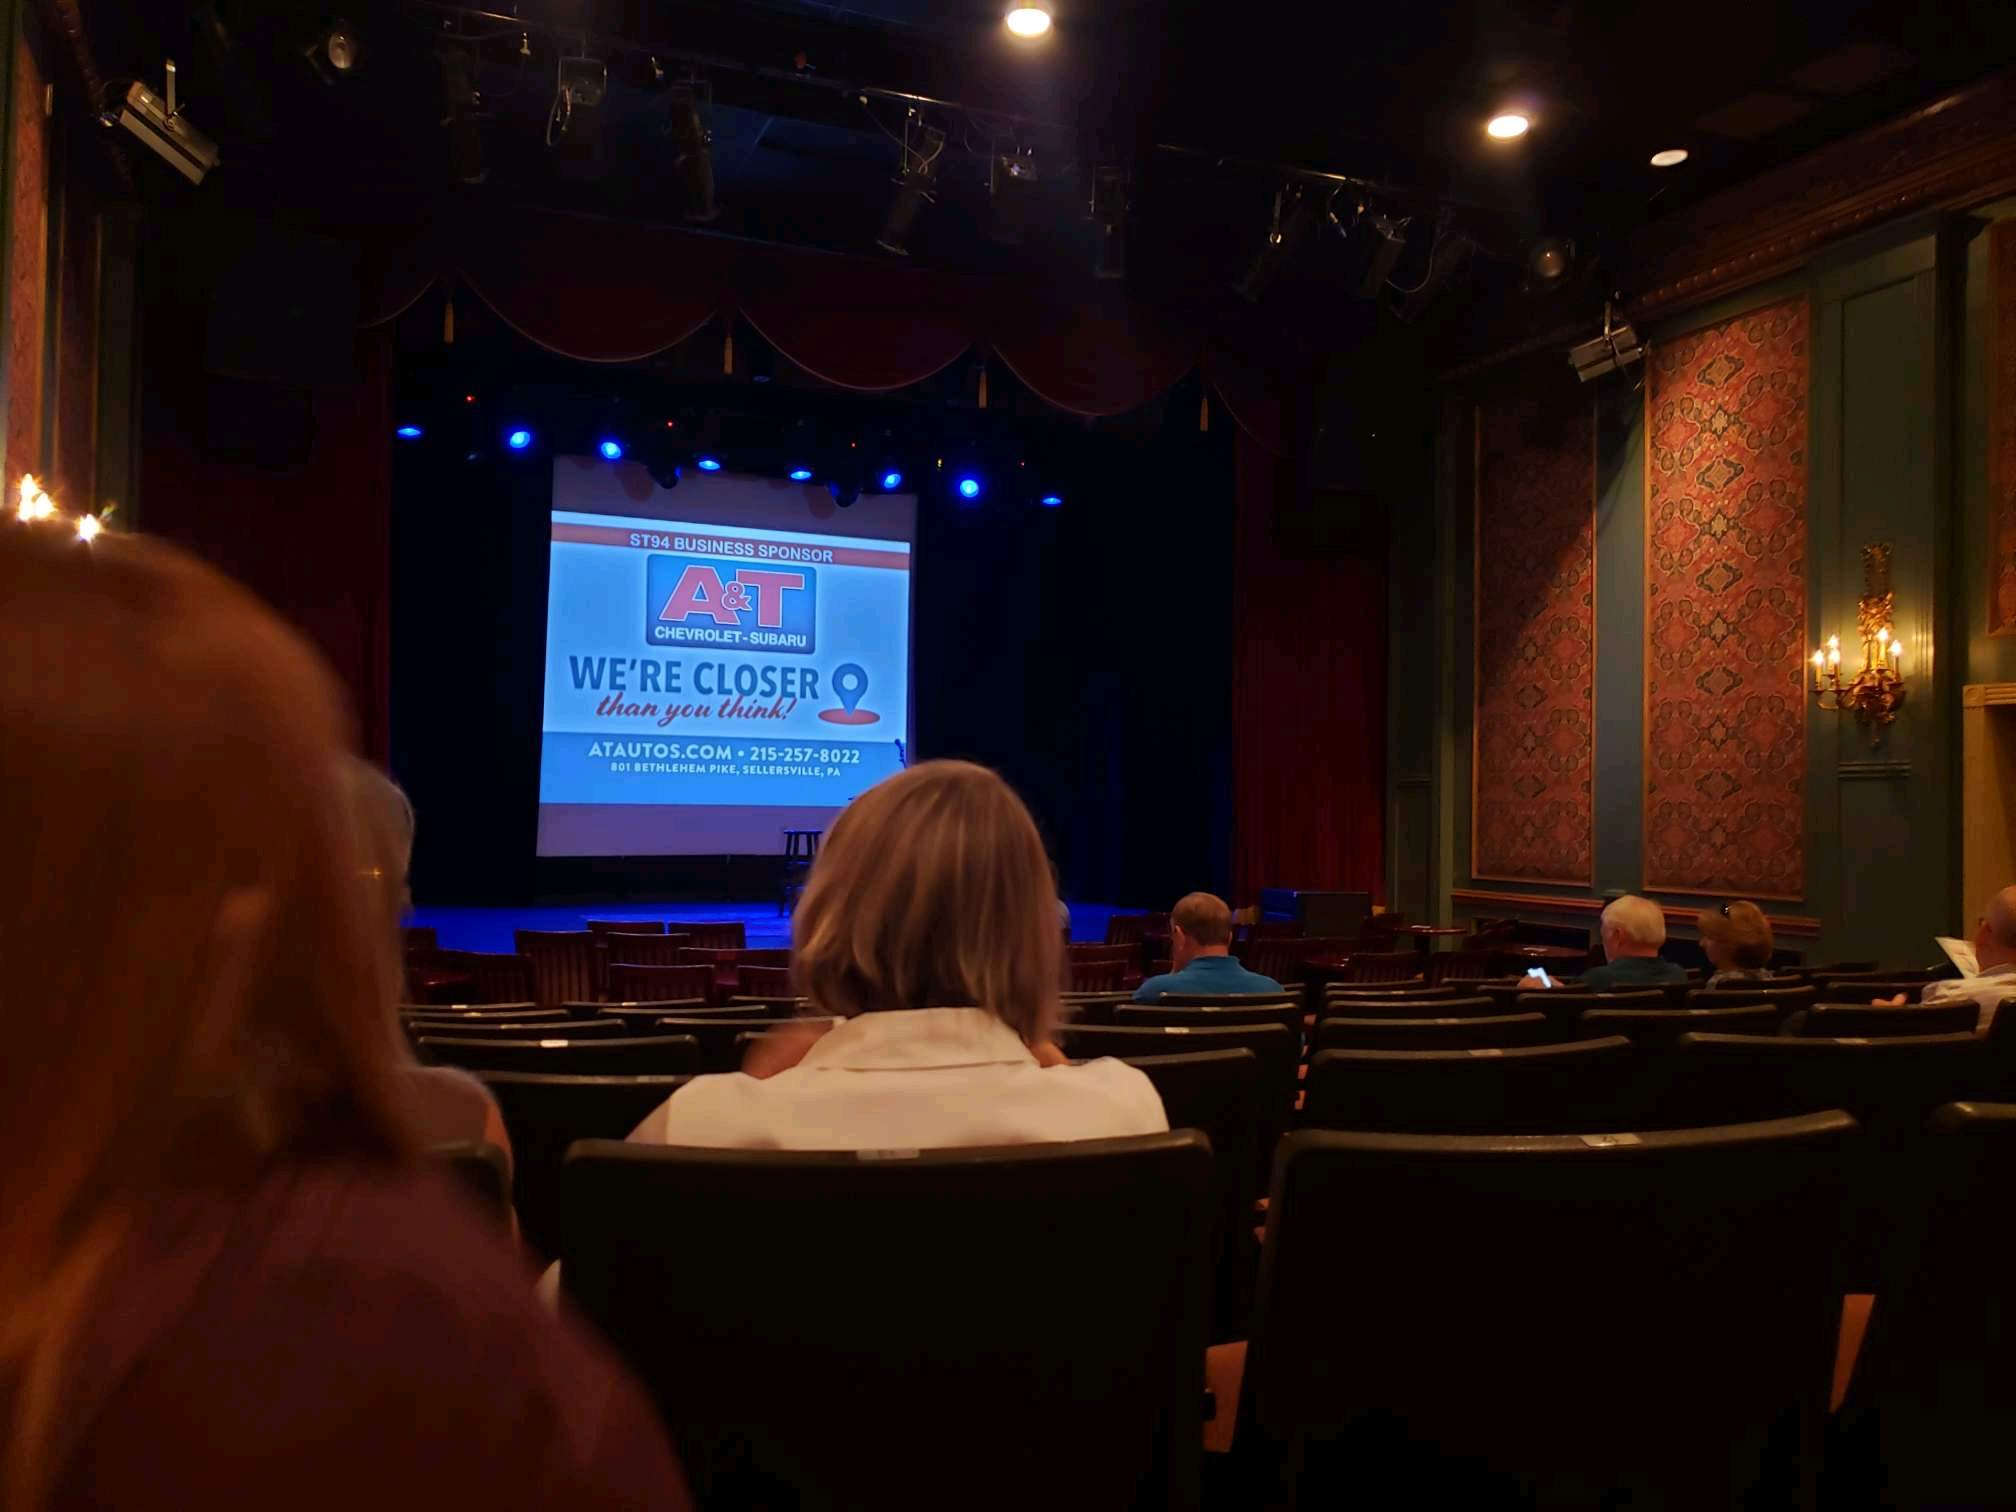 Sellersville Theater Sección First half Fila H Asiento 14